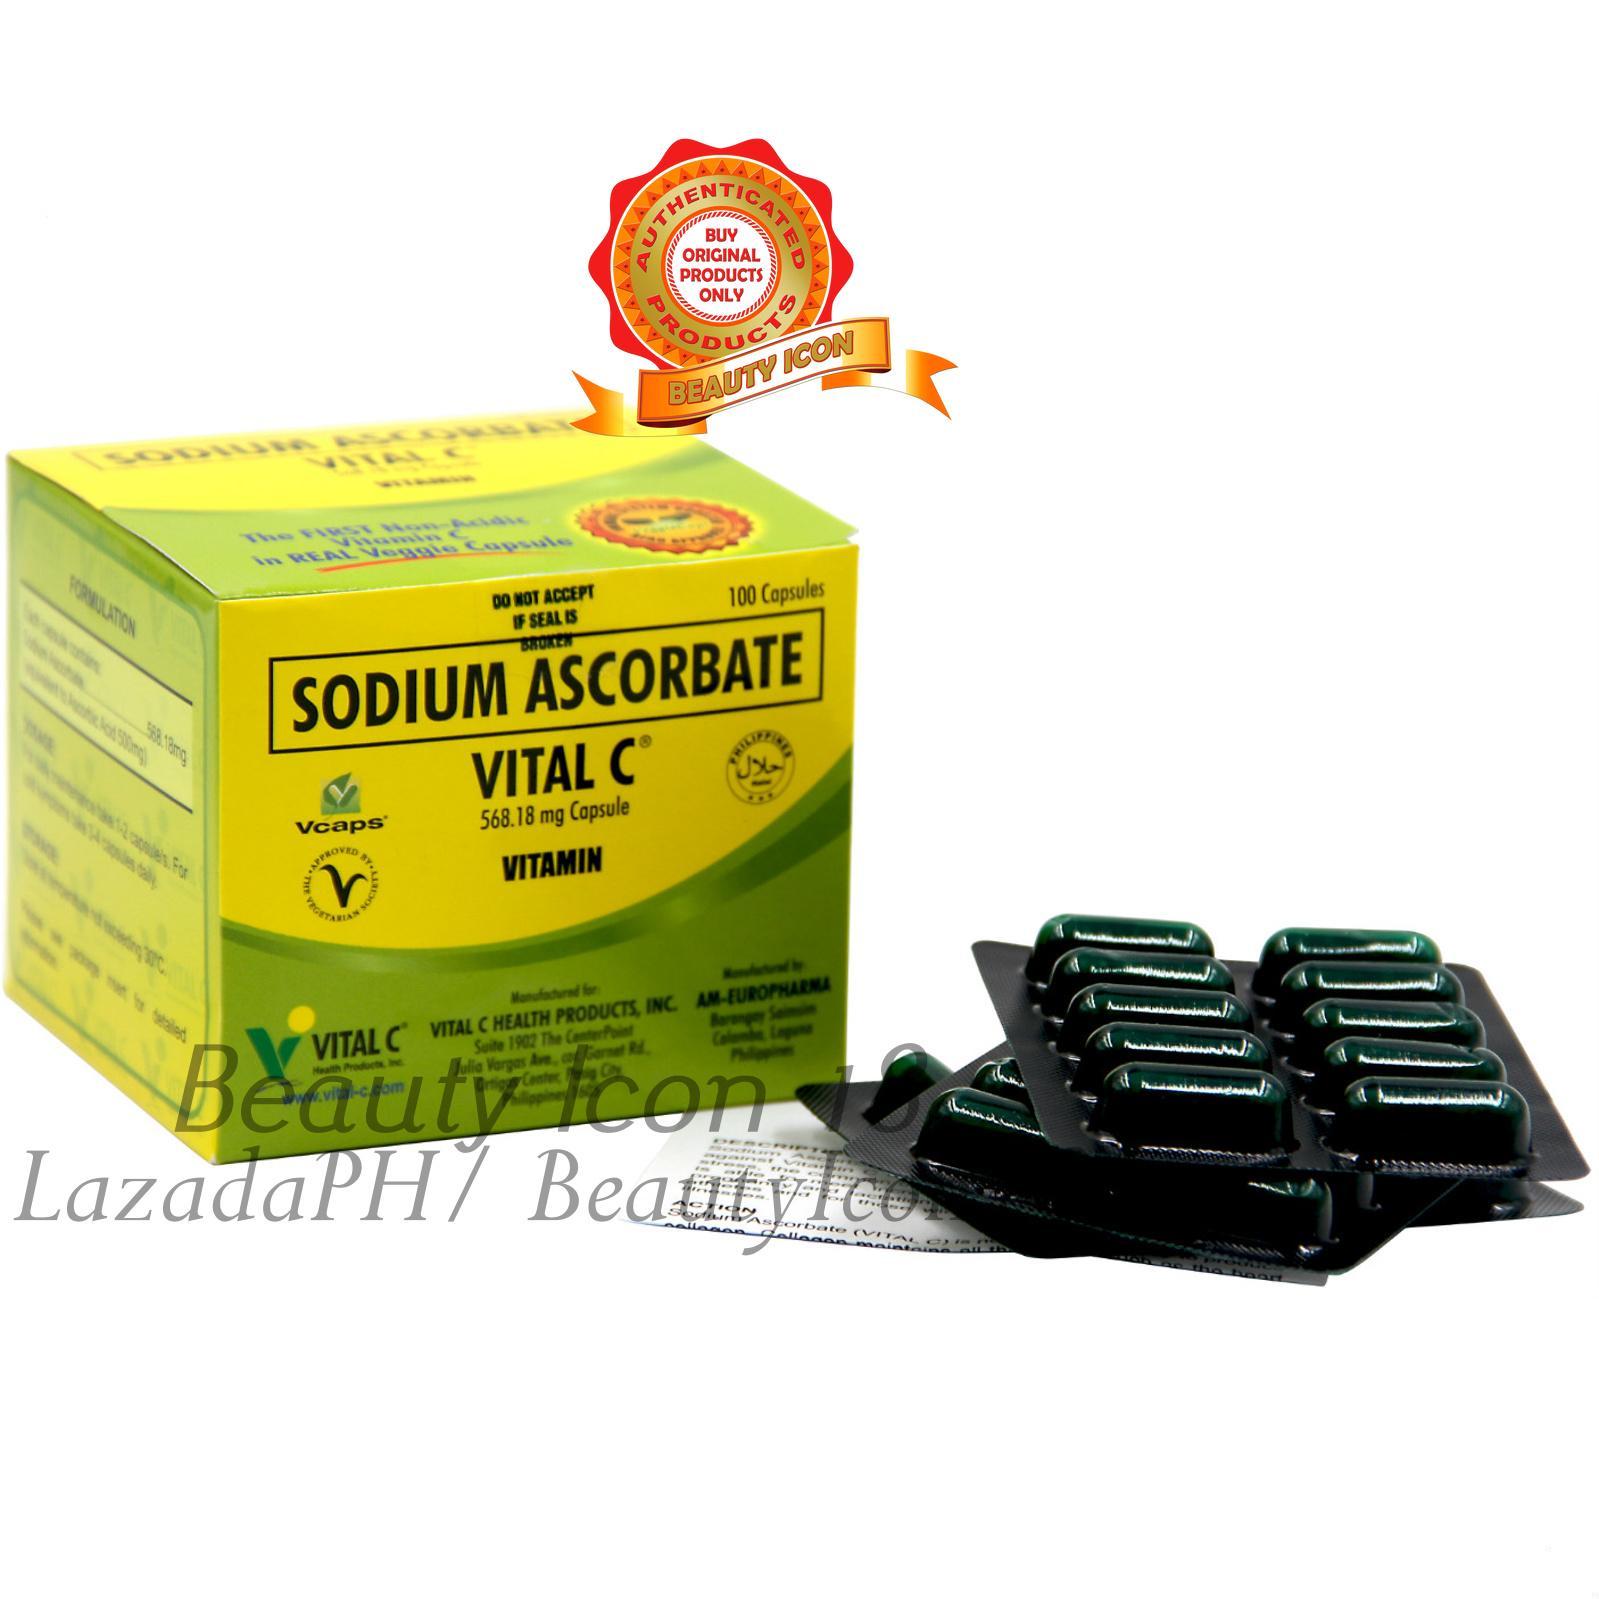 Vital C Sodium Ascorbate 568 18mg Capsule By 100s